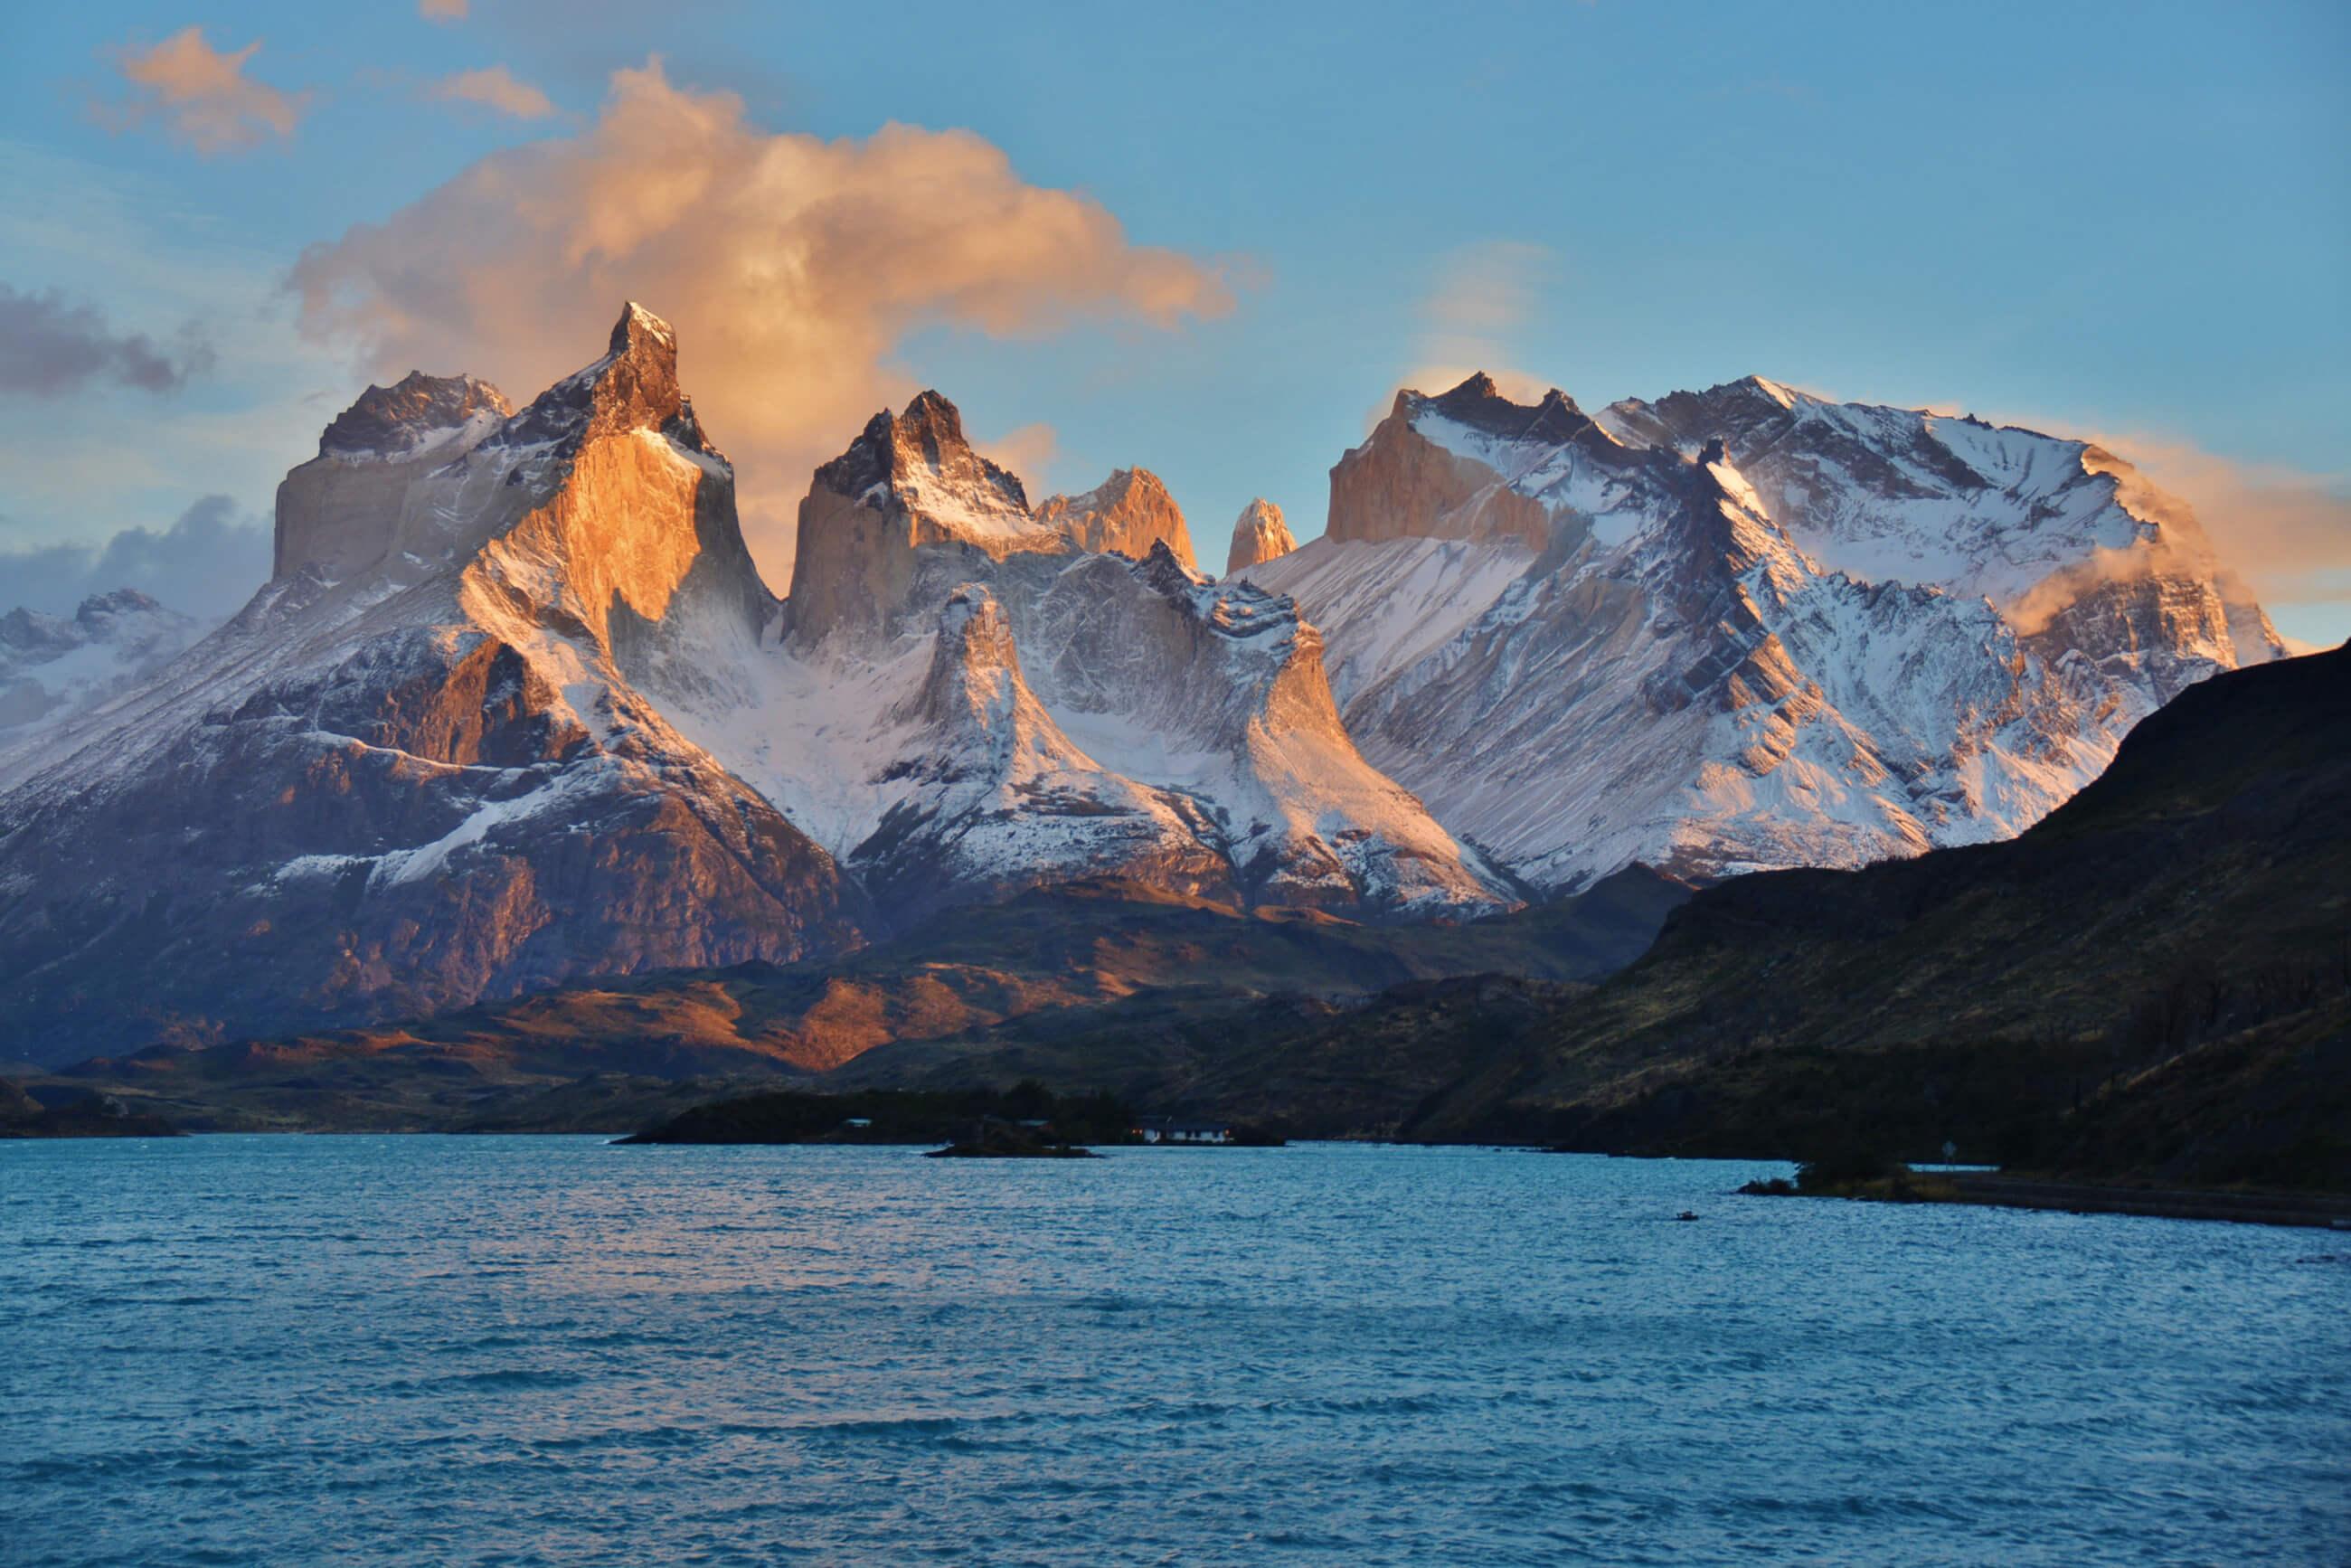 https://bubo.sk/uploads/galleries/5017/patagonia-chile-mirka-sulka-87-.jpg